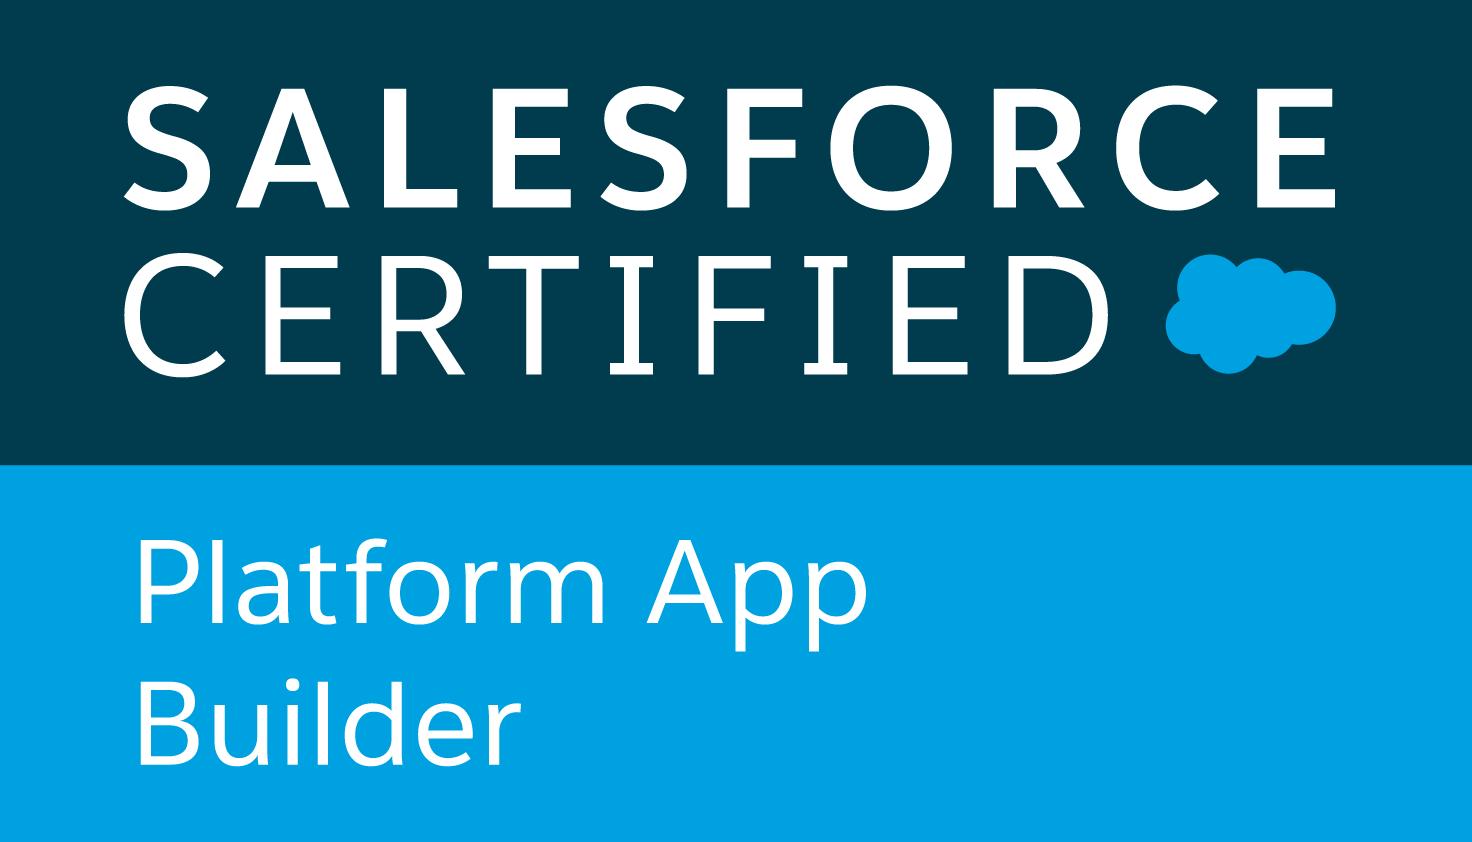 Platform App Builder